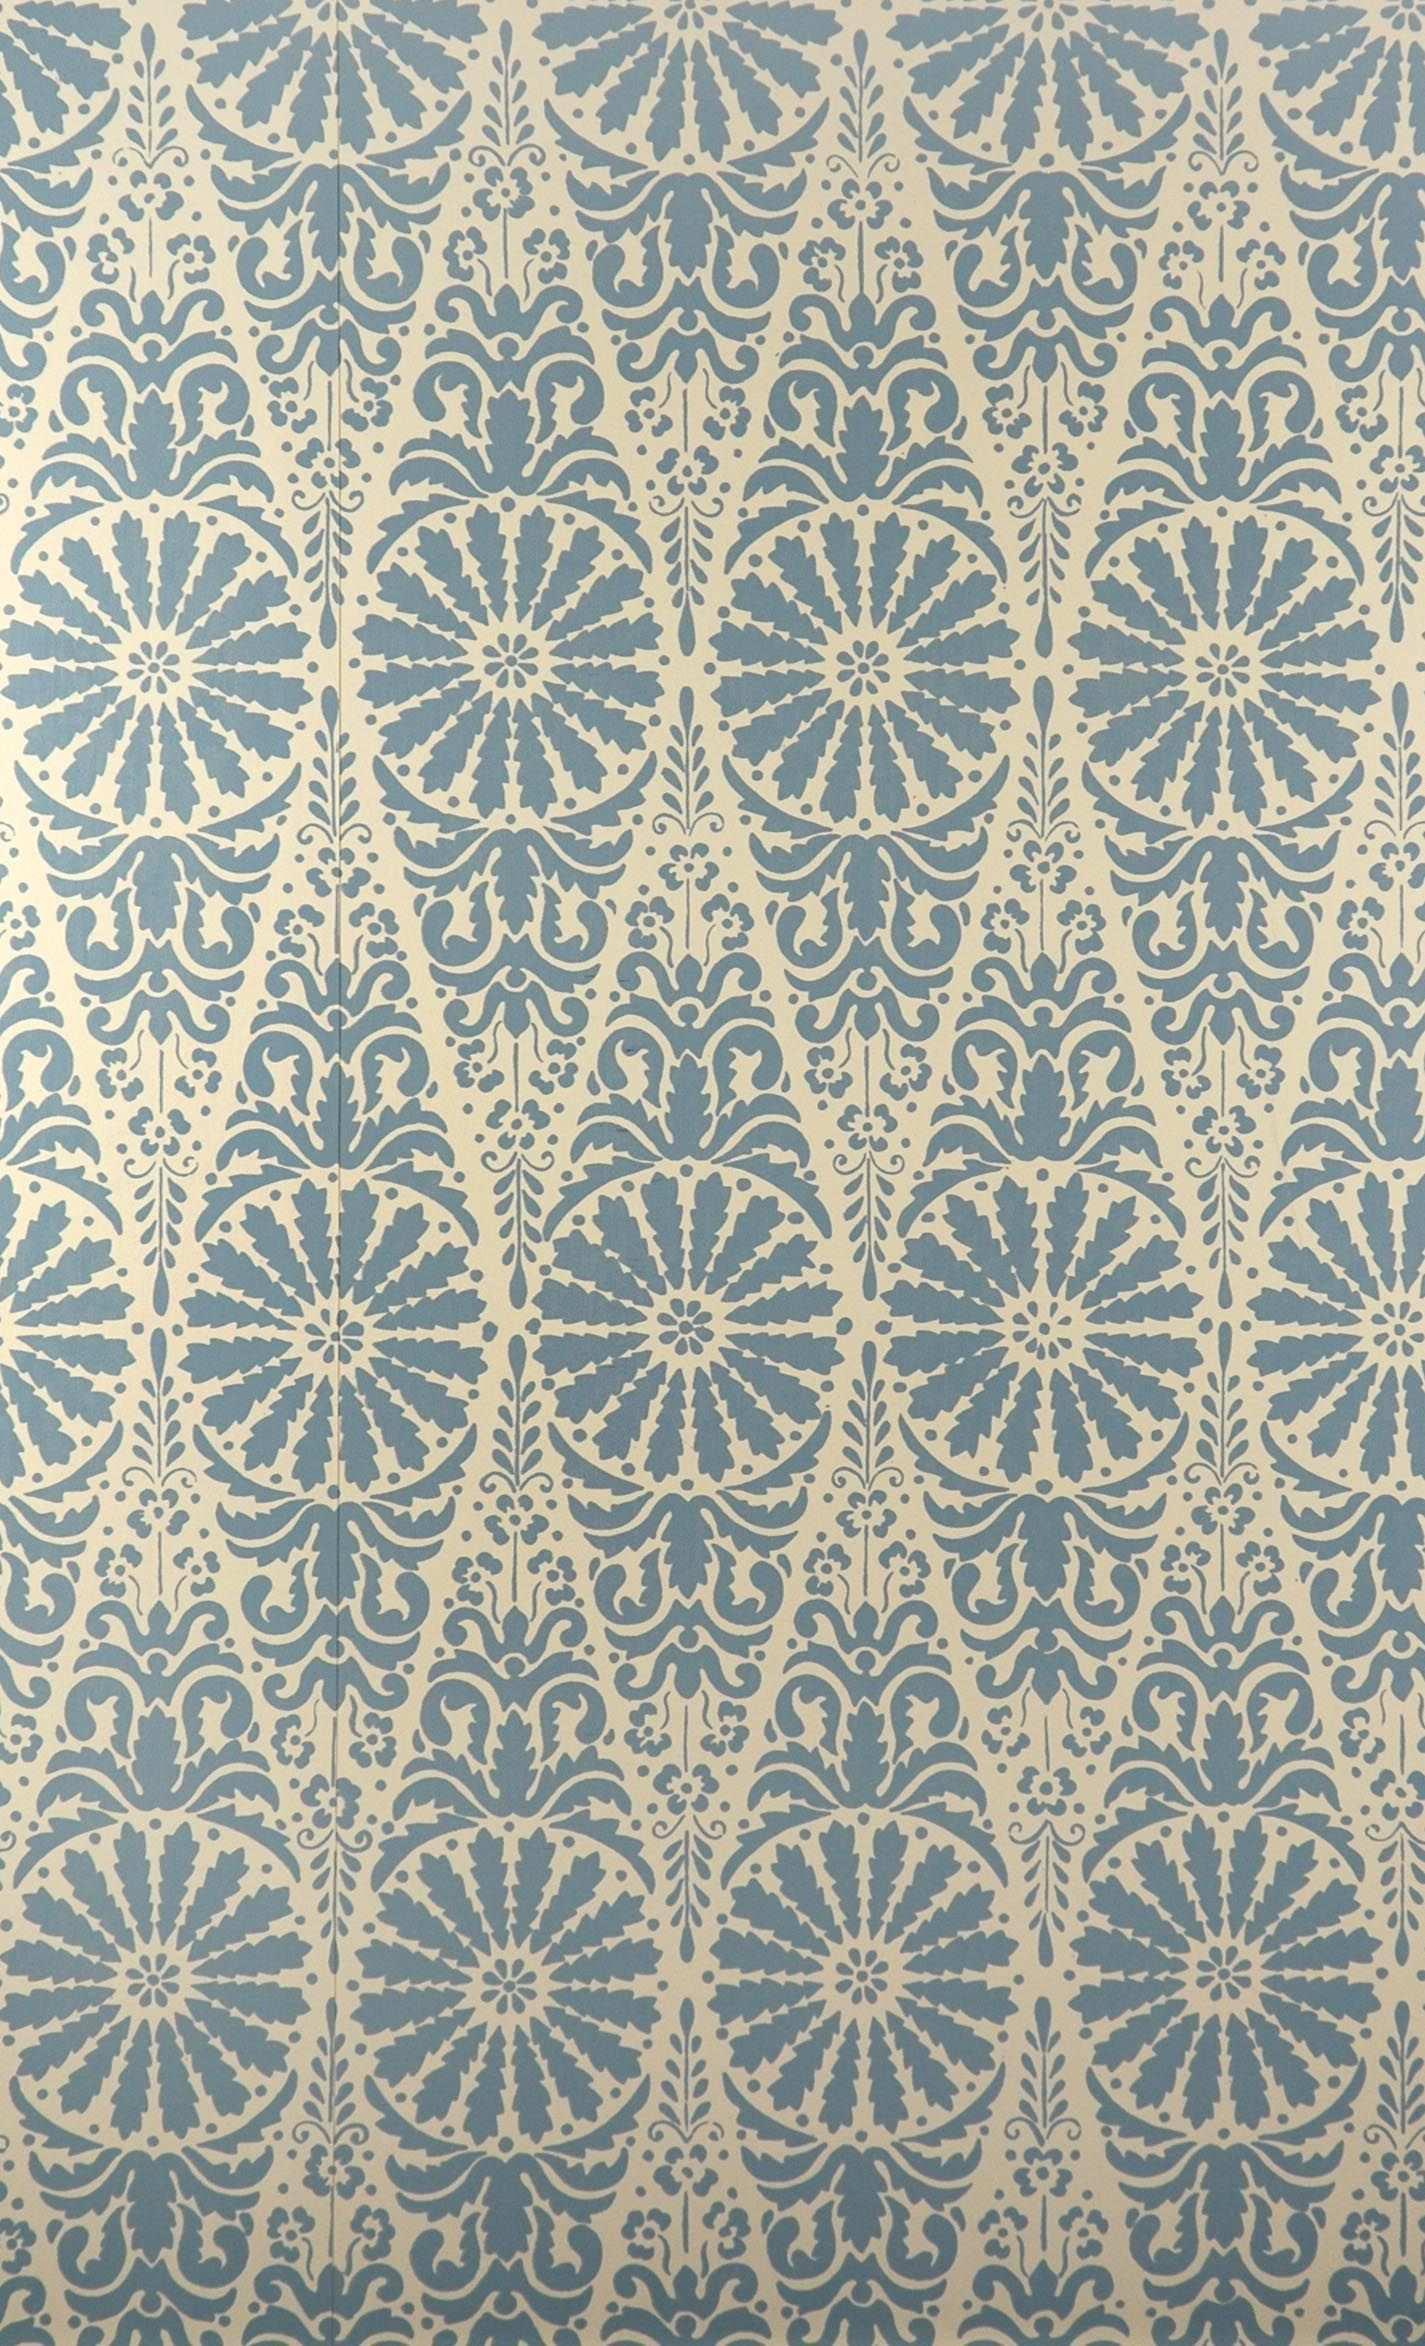 Tapete 1363 C Josephine Blau Historische Tapeten Hembus Gmbh Tapeten Farben Und Tapeten Mustertapete